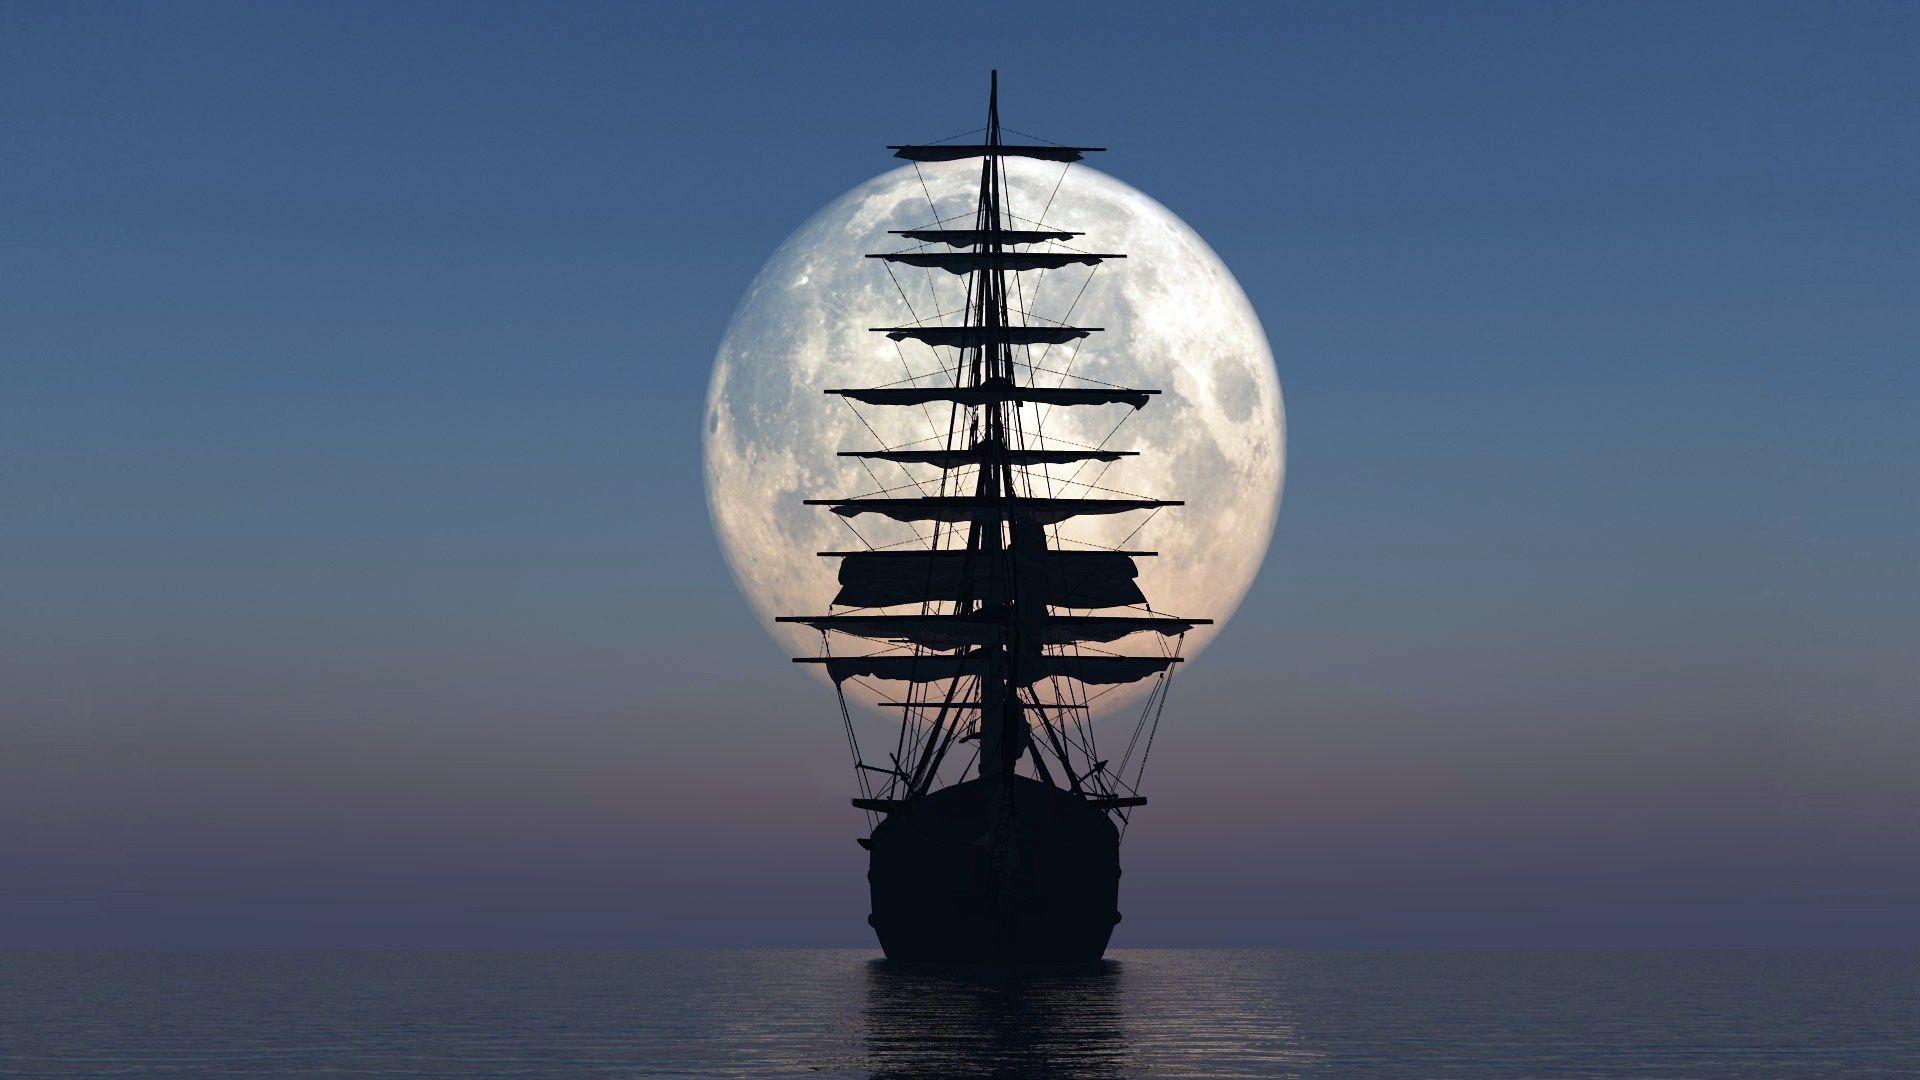 Fantastic Full Moon Over An Old Sail Ship HD Desktop